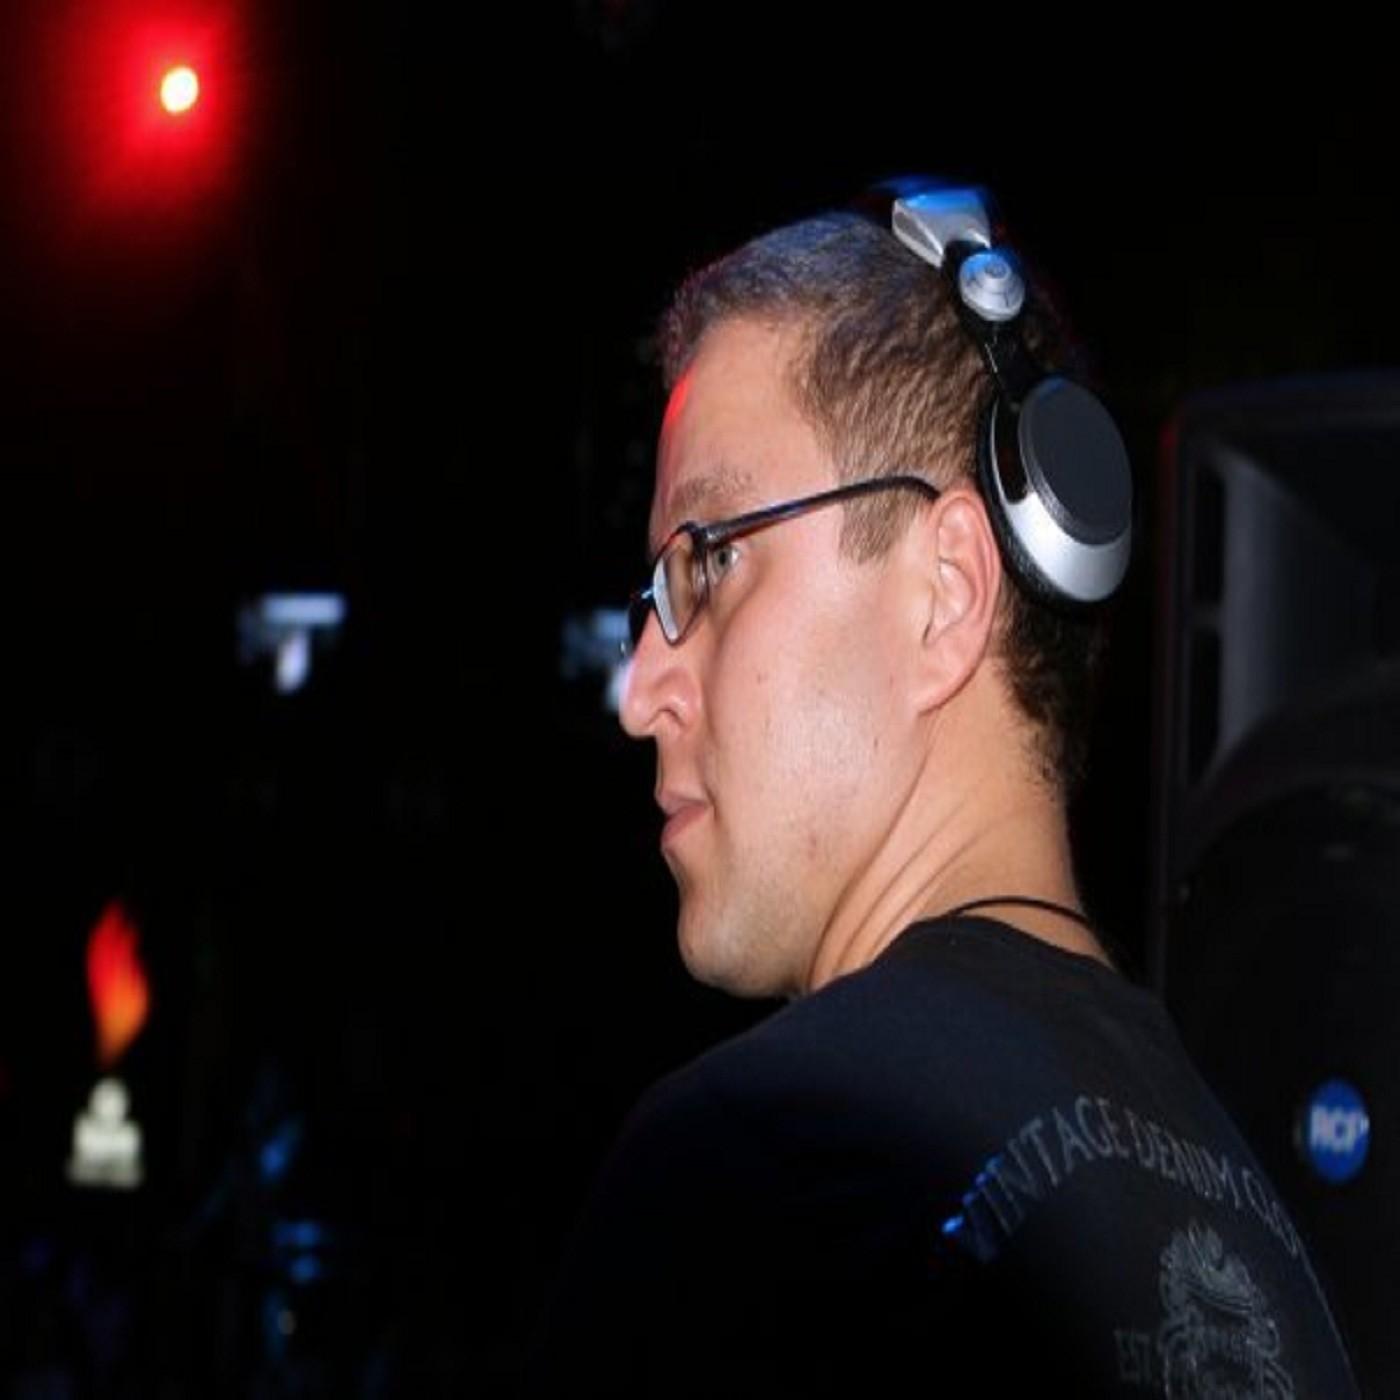 DJ Roman Zhukov